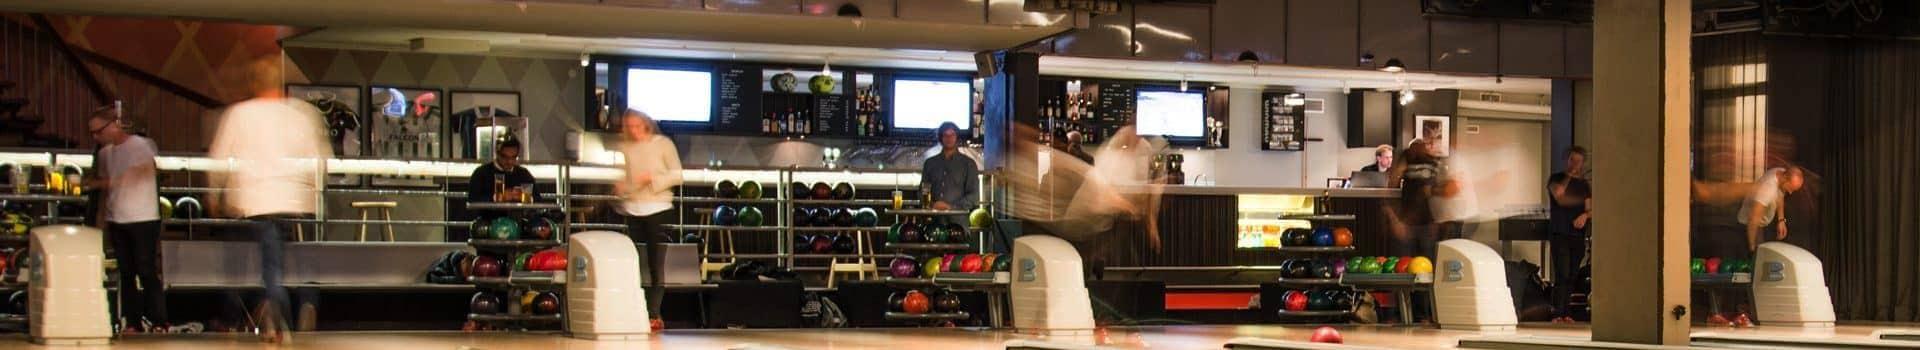 bowling högdalen öppettider